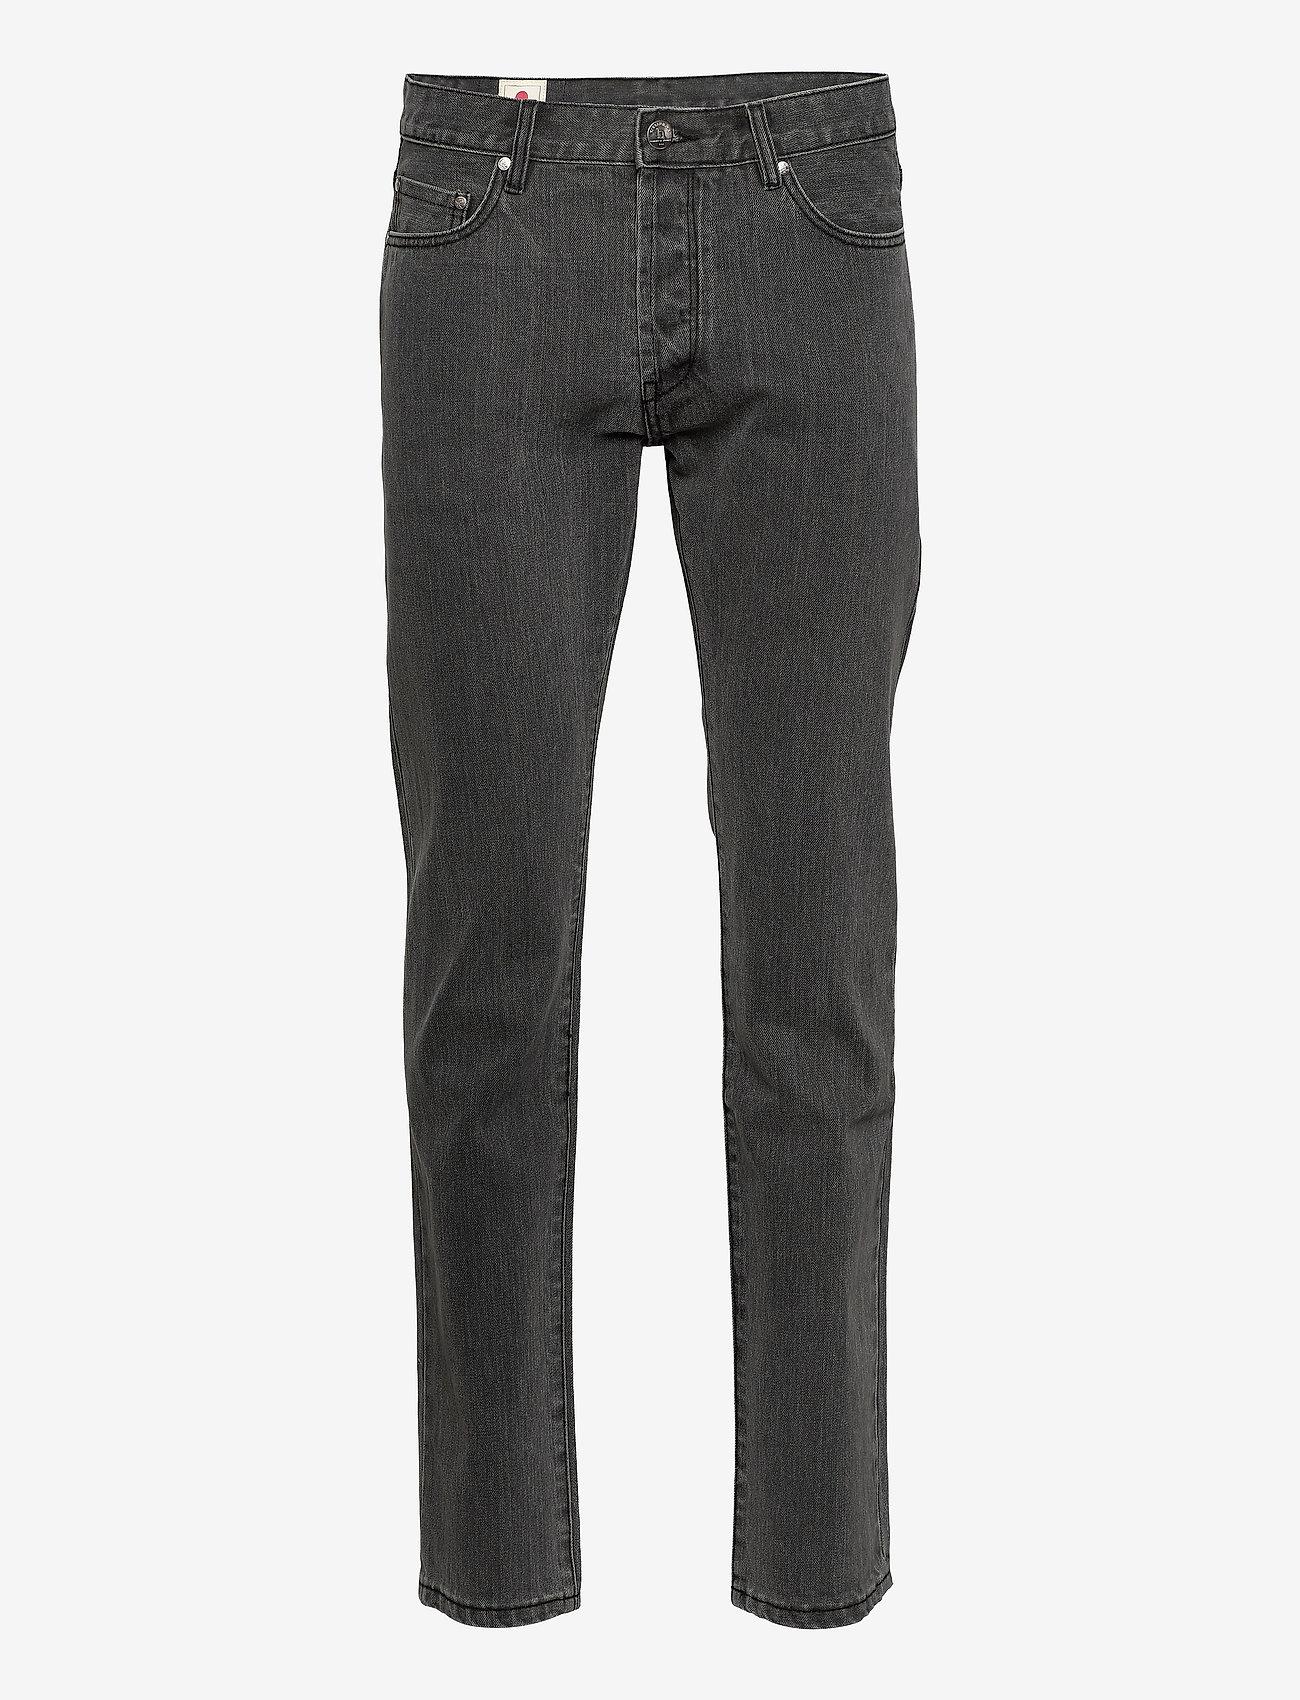 HAN Kjøbenhavn - Tapered Jeans - regular jeans - black stone wash - 0